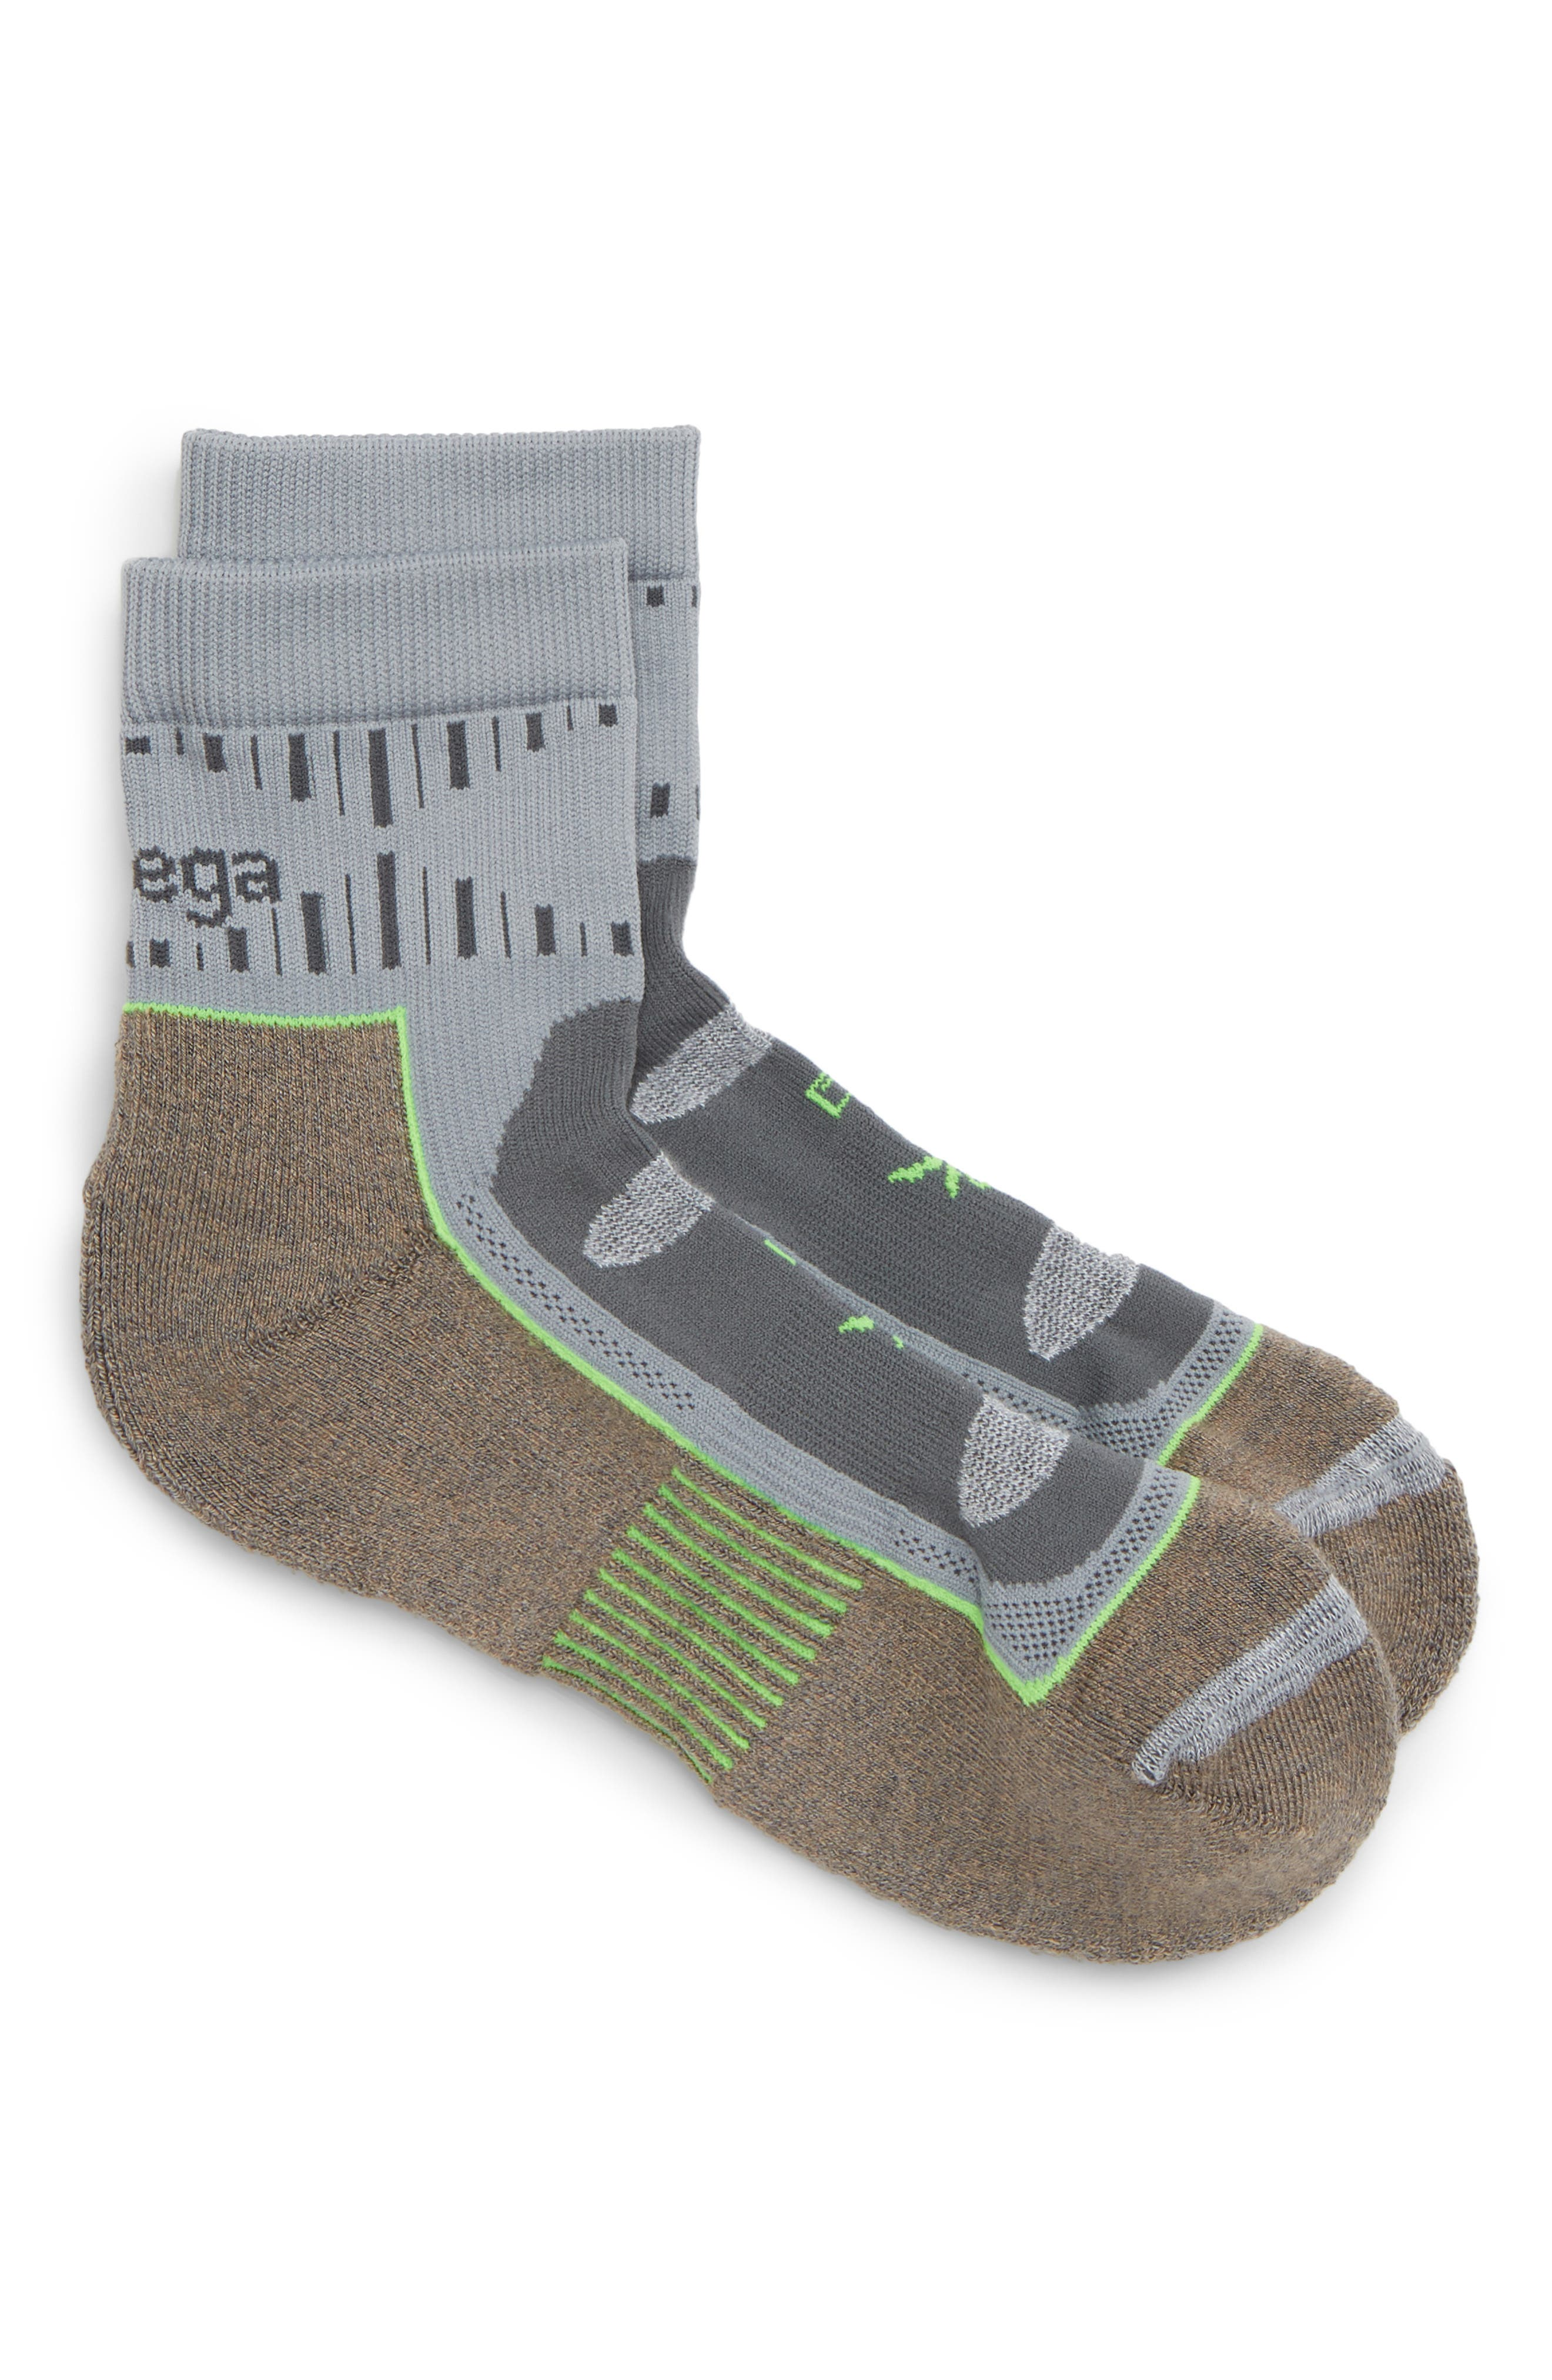 Nord Blast Quarter Socks,                         Main,                         color, MINK/ GREY